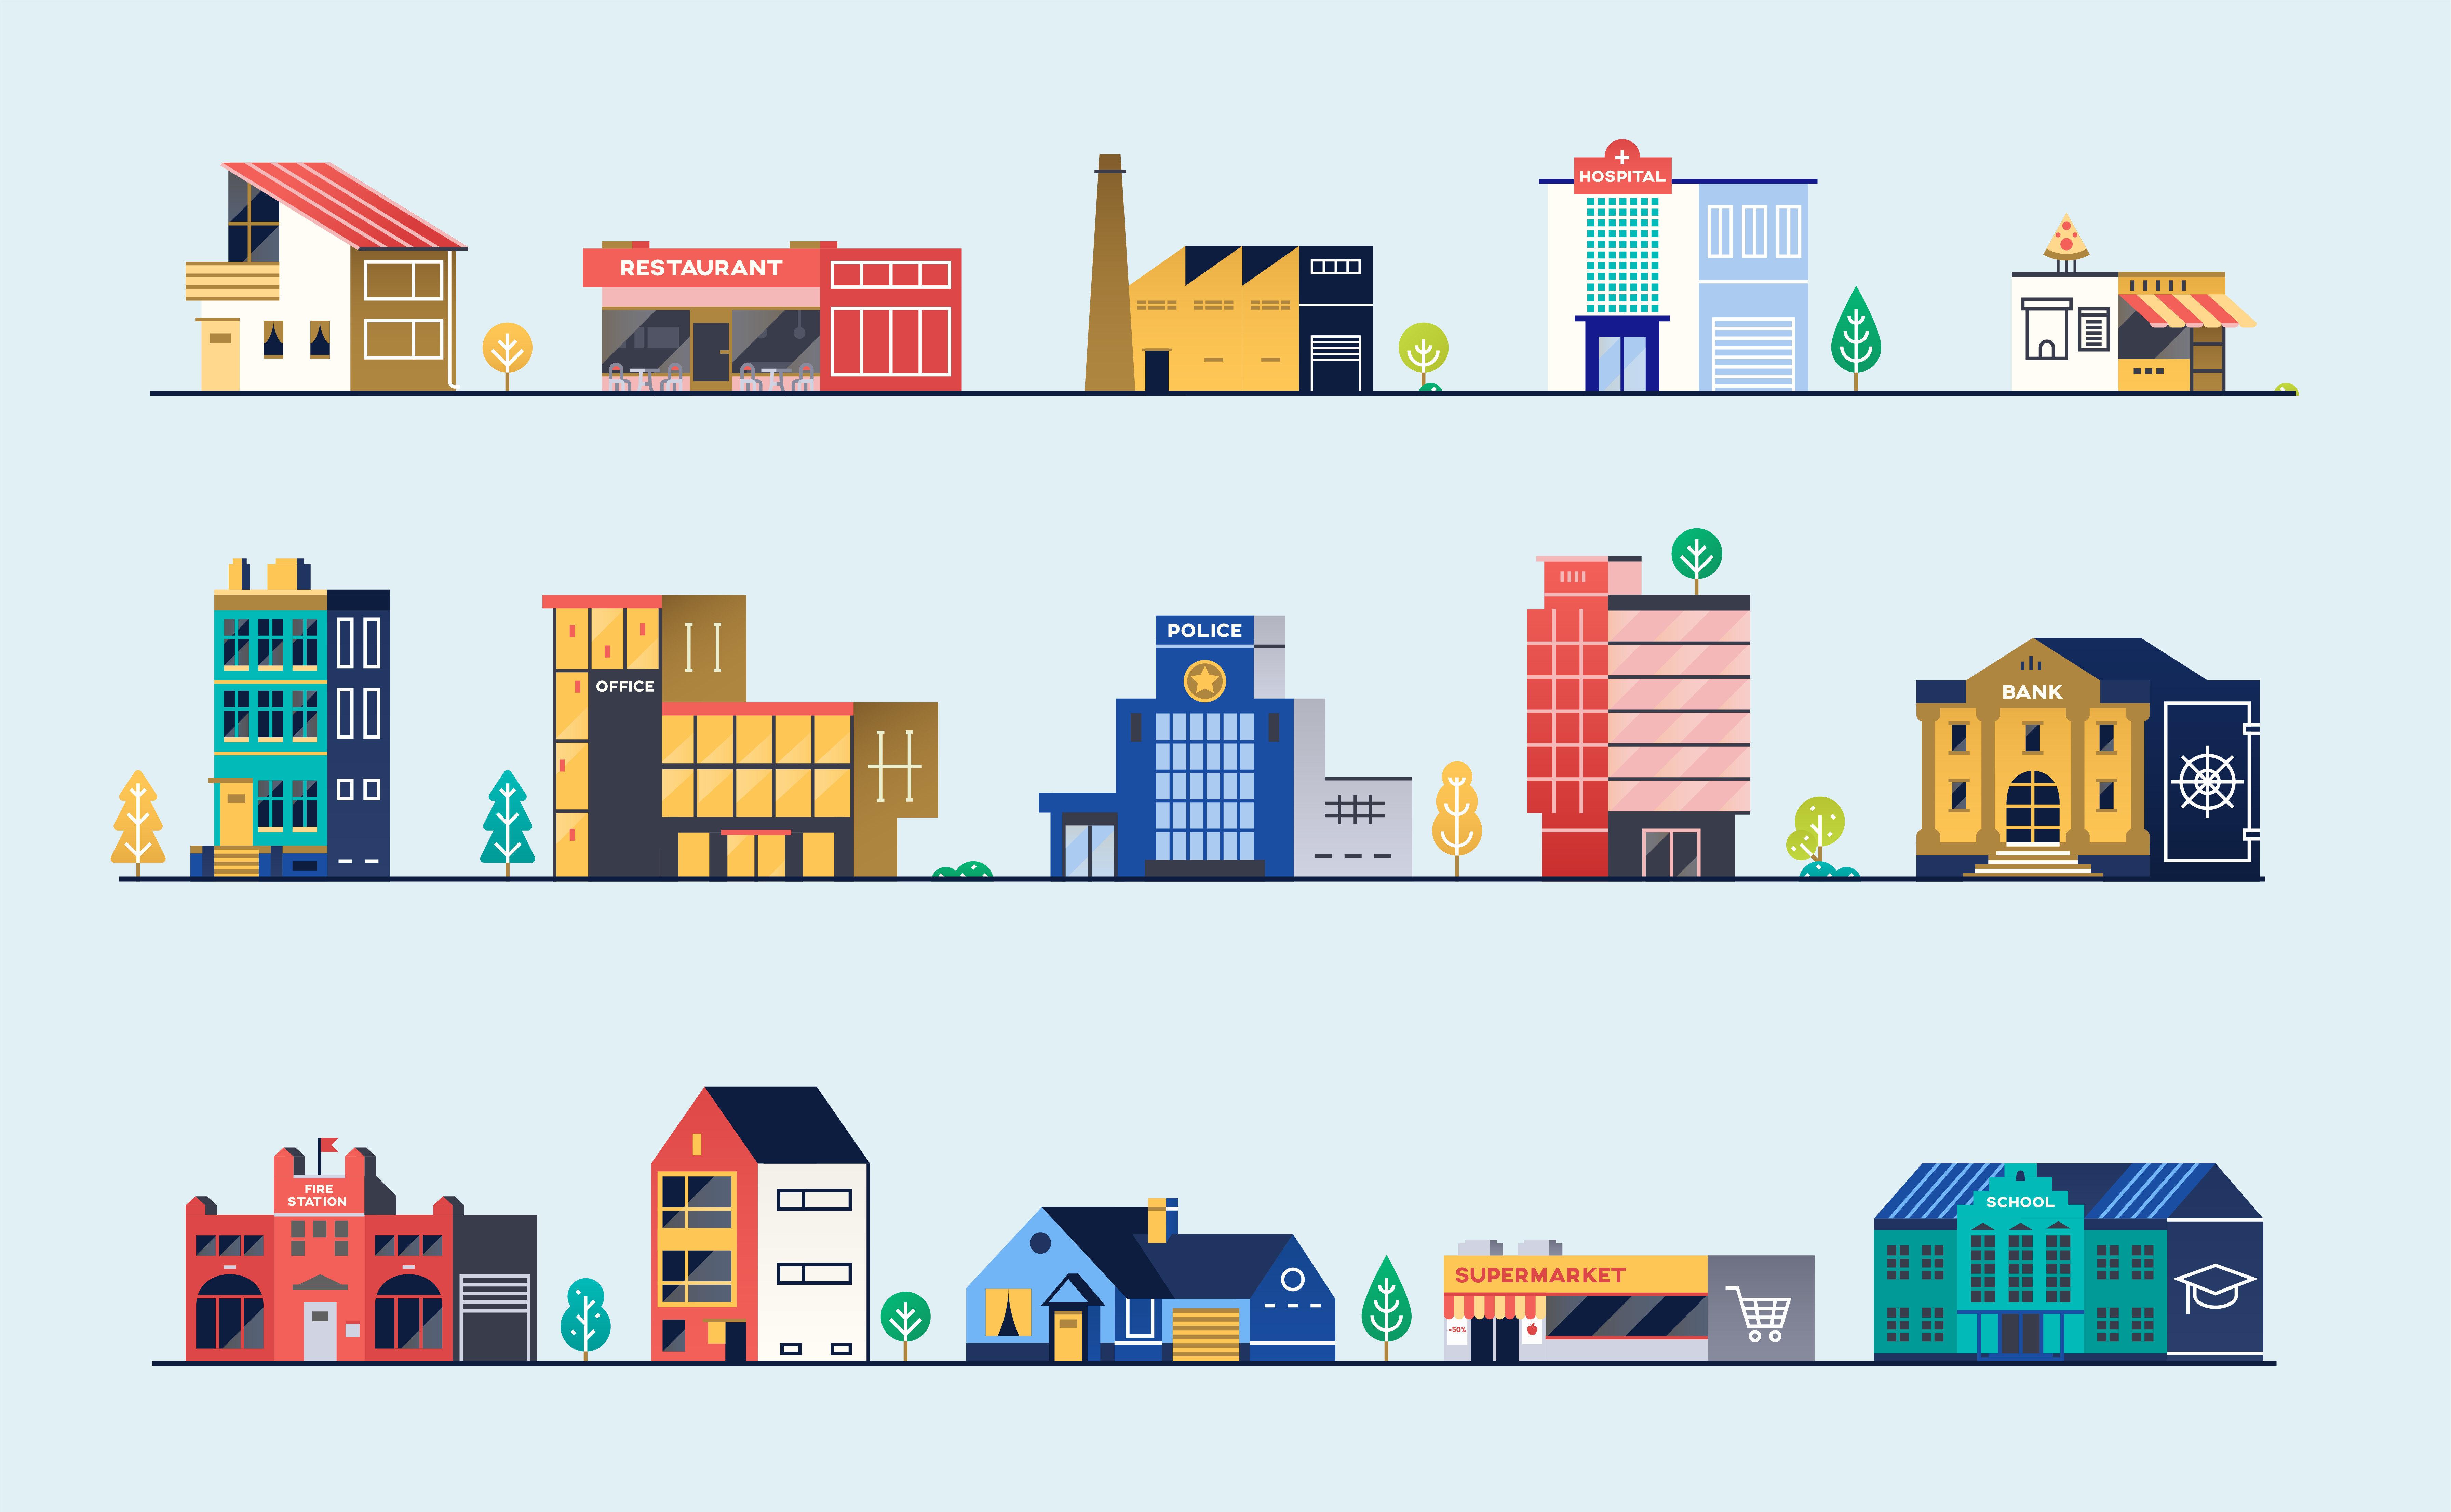 Set of city buildings. Bank, hospital, fire station, police station, shops and restaurants. Vector illustration